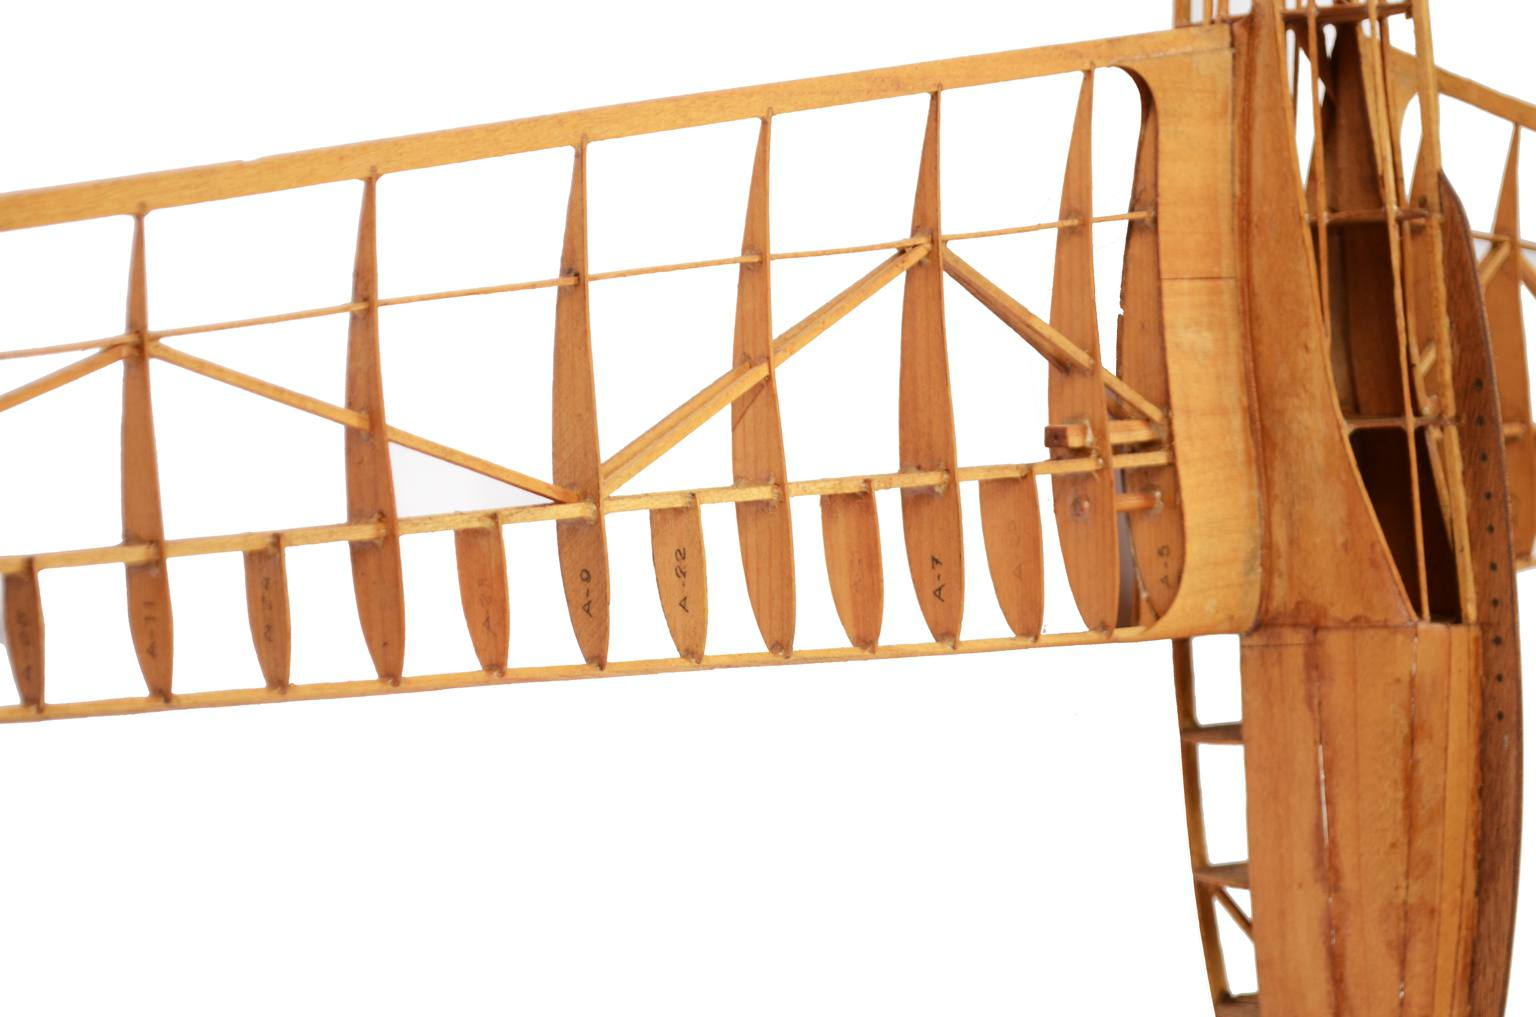 Aerei d'epoca/6336-Modellino aereo